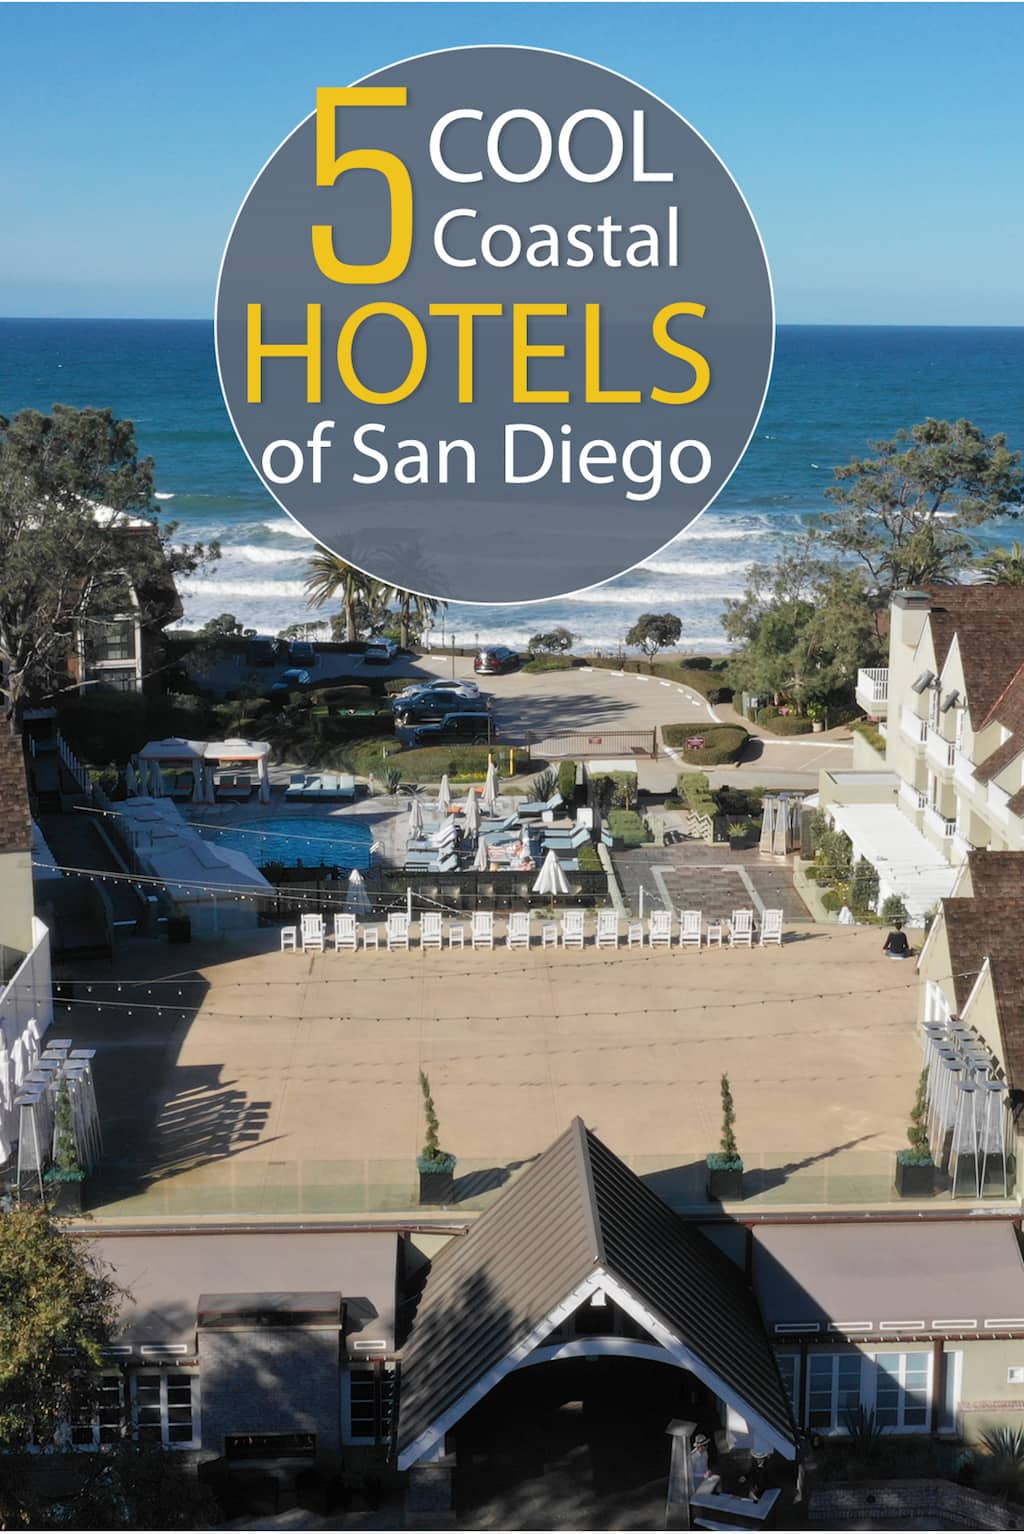 5 Cool Coastal Hotels of San Diego (Pinterest Pin)